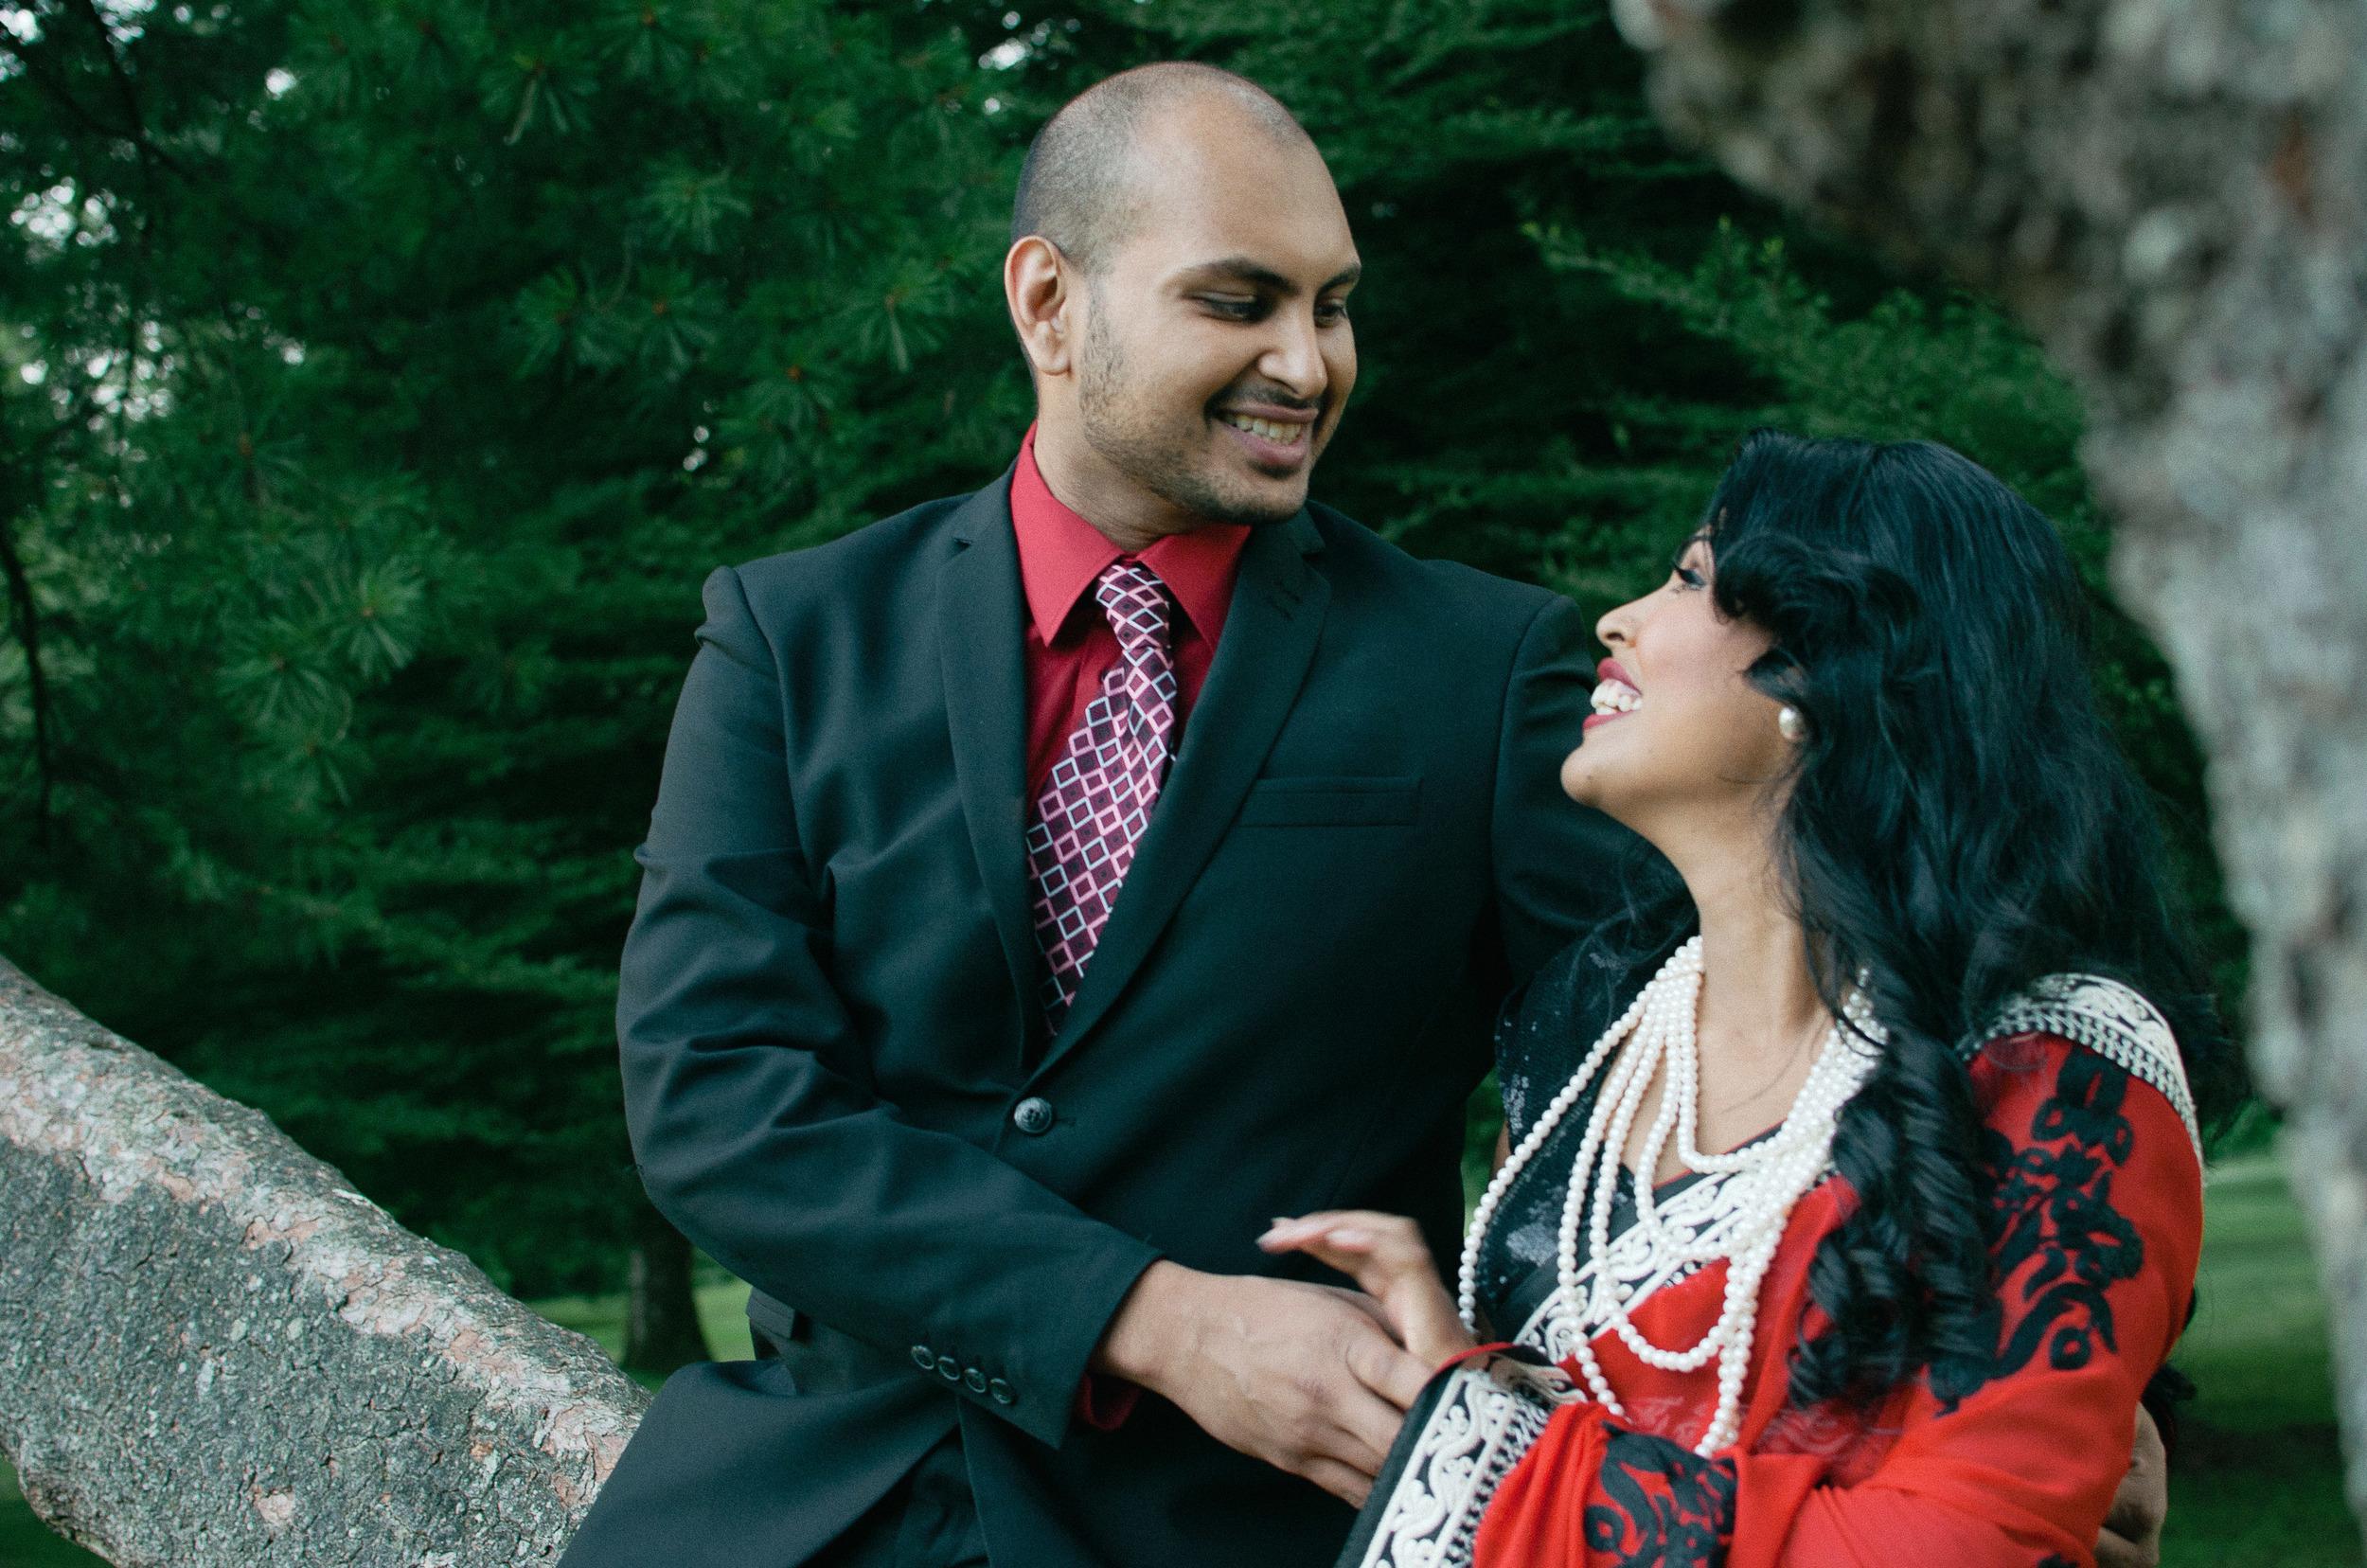 Amresh + Salona_Katie Powell Photography Vancouver Engagement Stanley Park Portraits-10.jpg